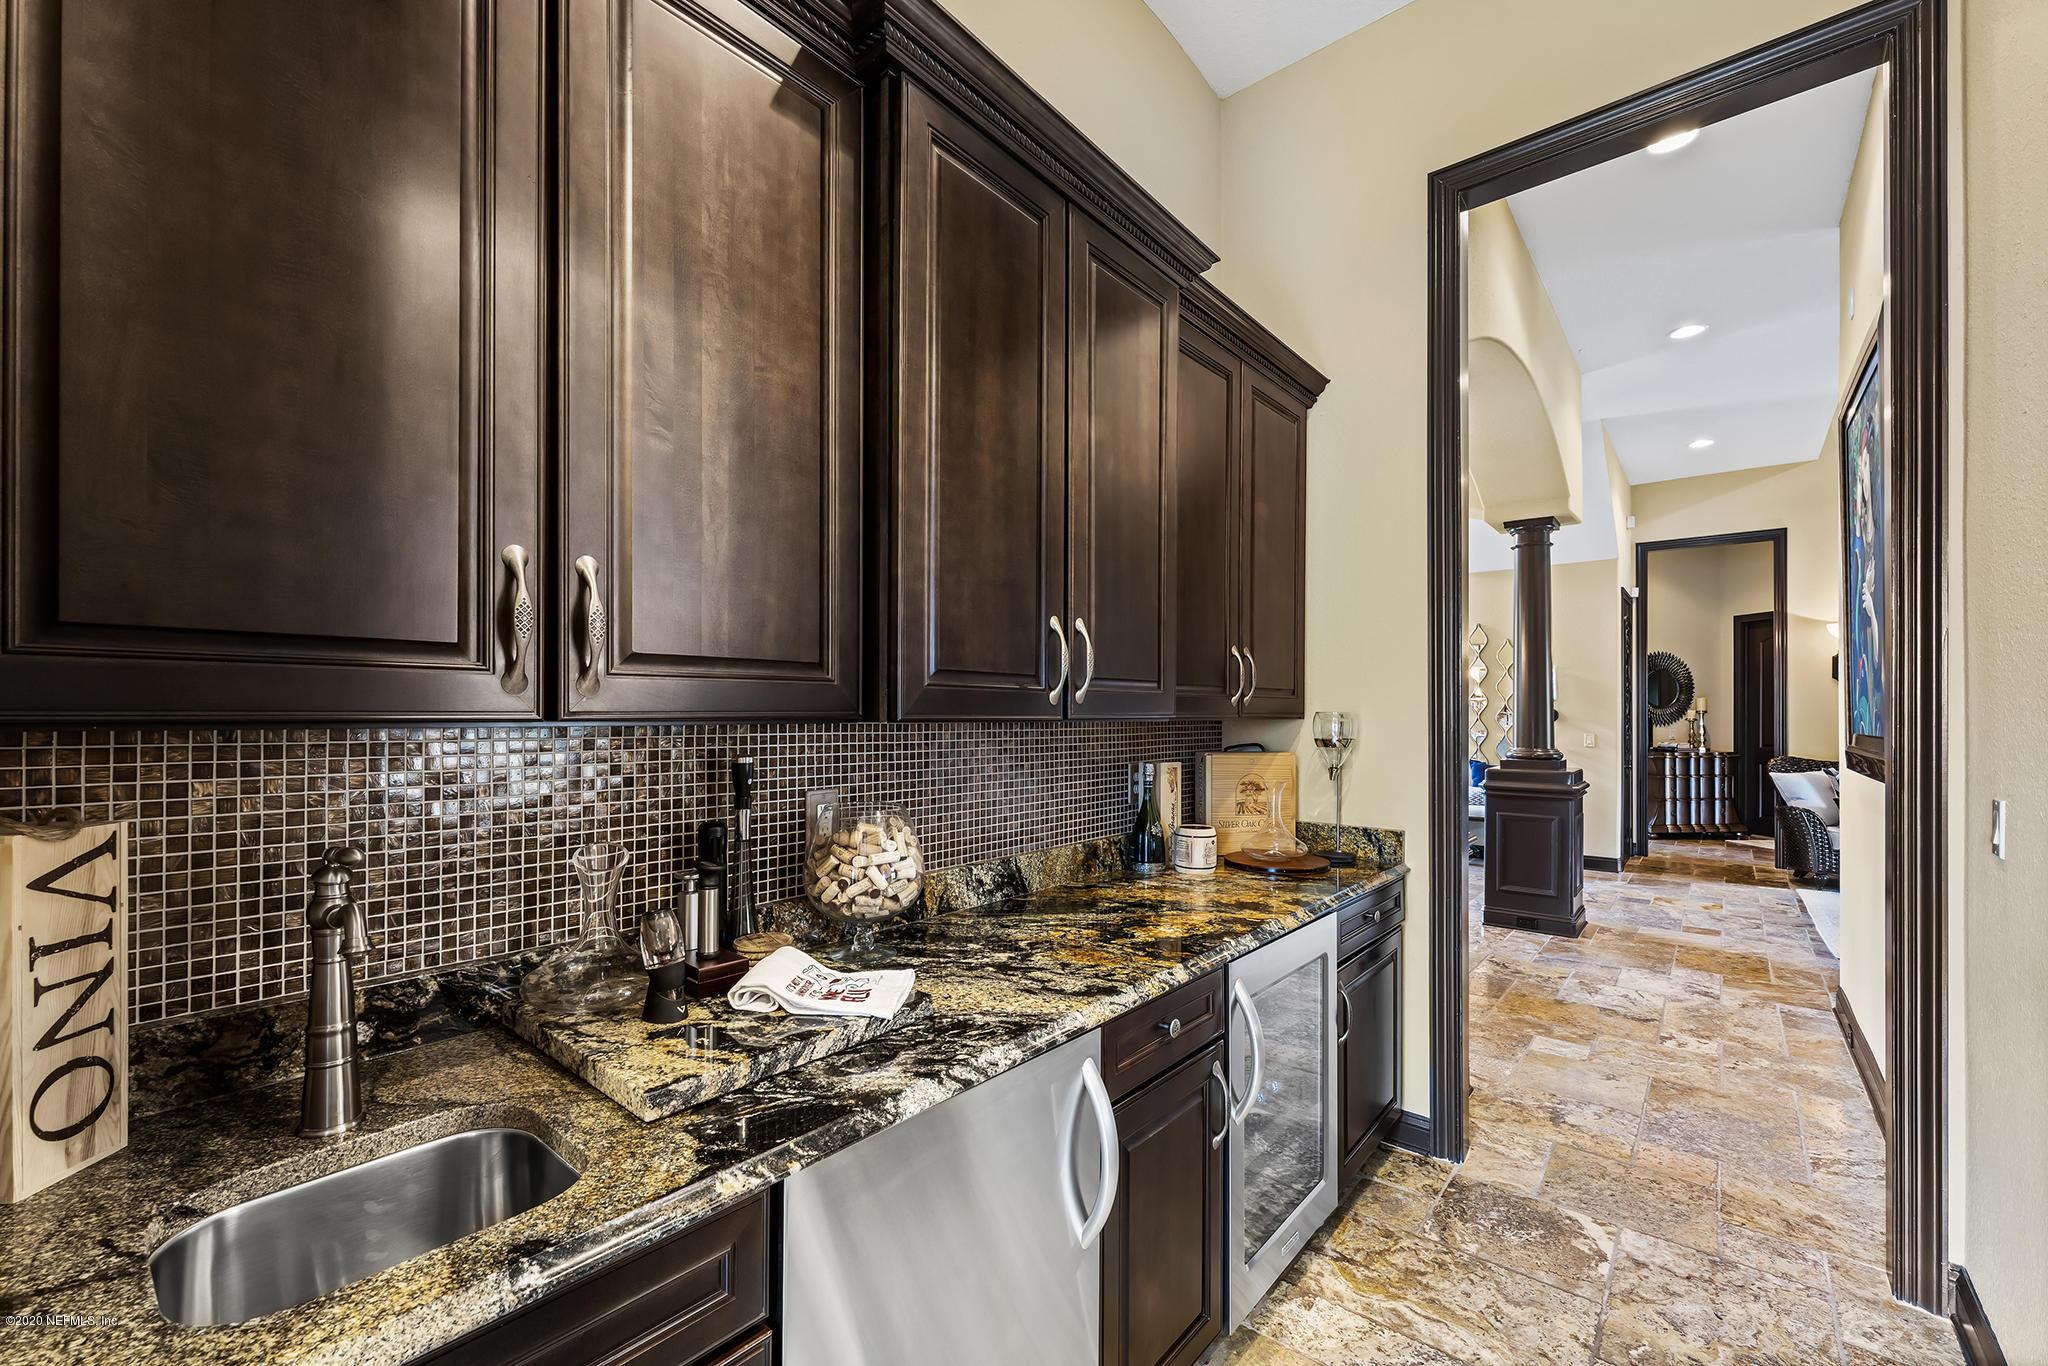 2853 GRANDE OAKS, FLEMING ISLAND, FLORIDA 32003, 6 Bedrooms Bedrooms, ,7 BathroomsBathrooms,Residential,For sale,GRANDE OAKS,1082573